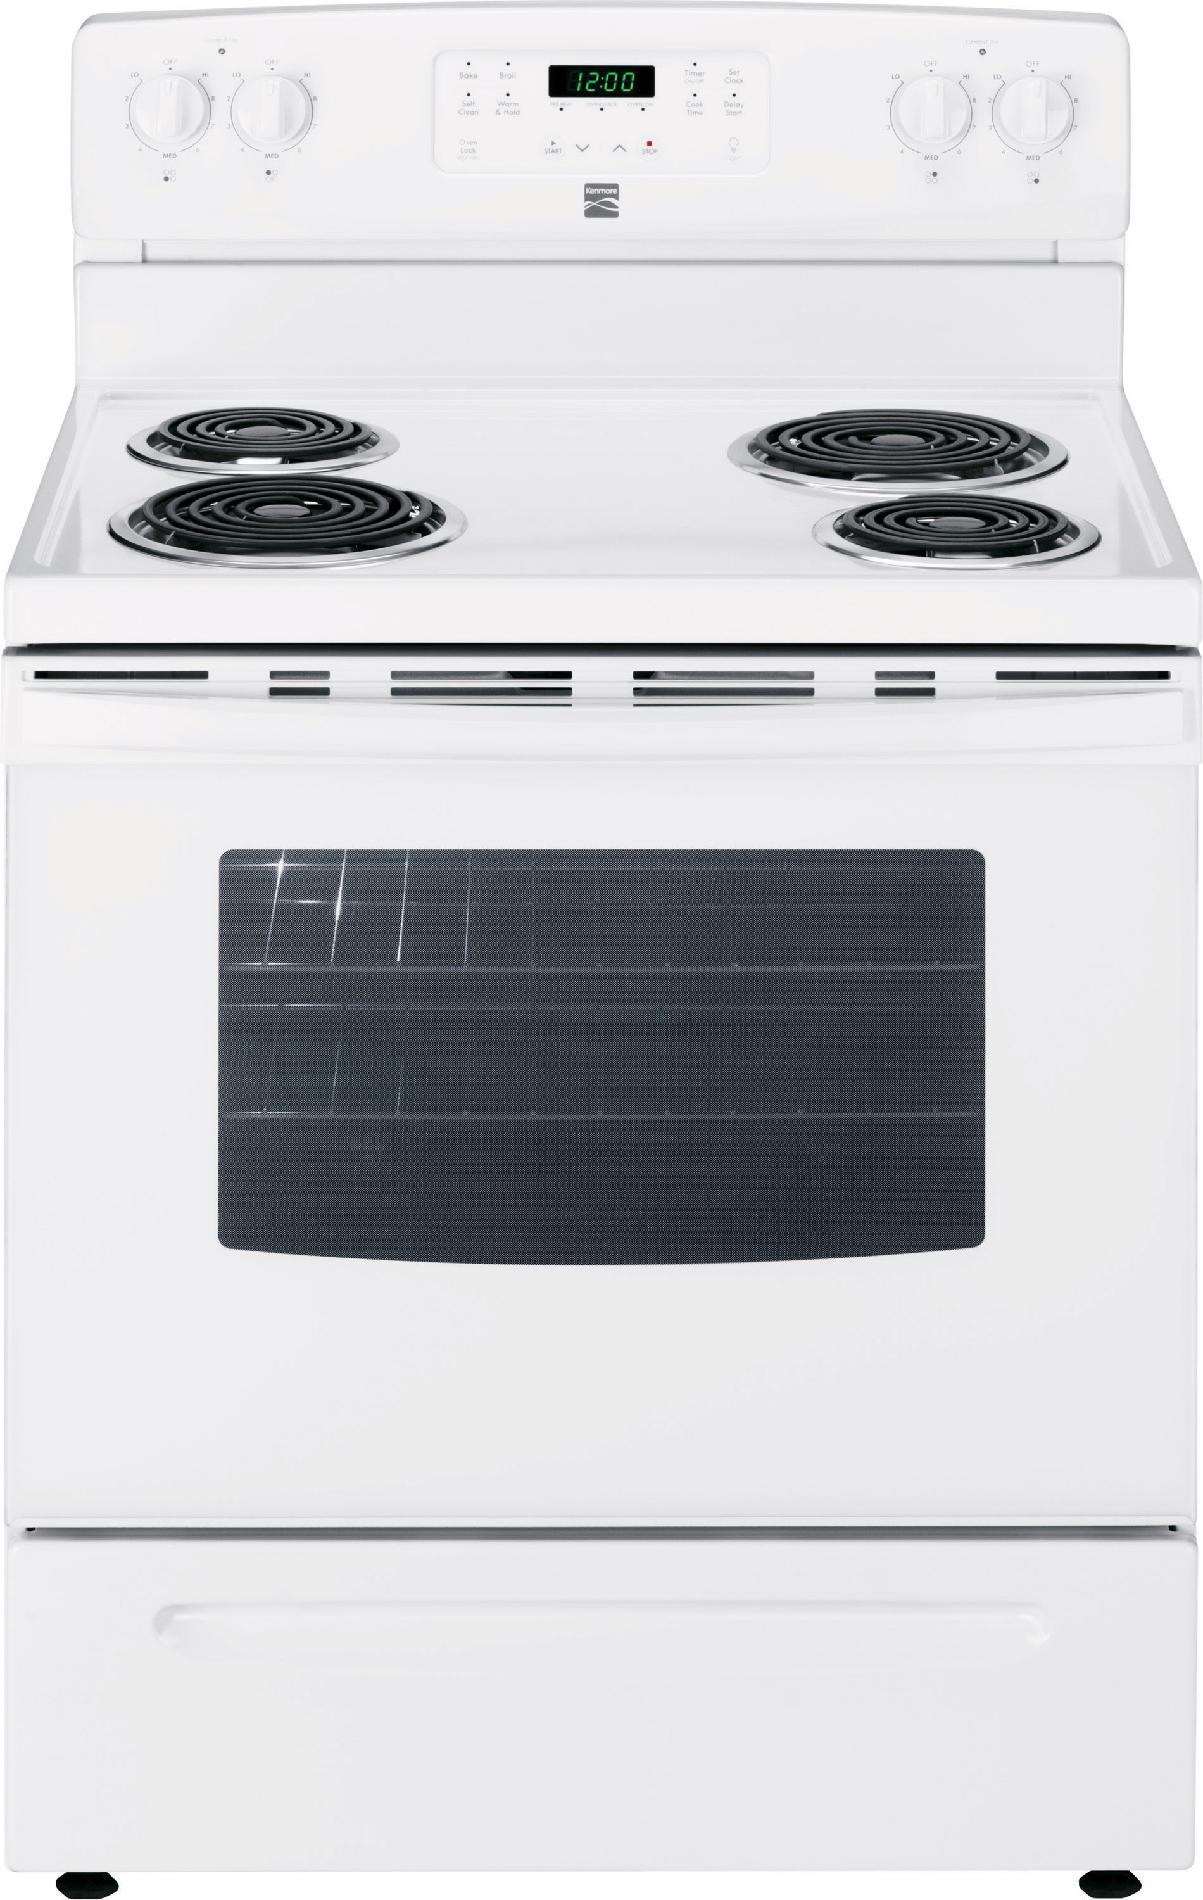 hotpoint oven wiring diagram goodman awuf air handler kenmore 94142 5 3 cu ft electric range white sears 022094142000